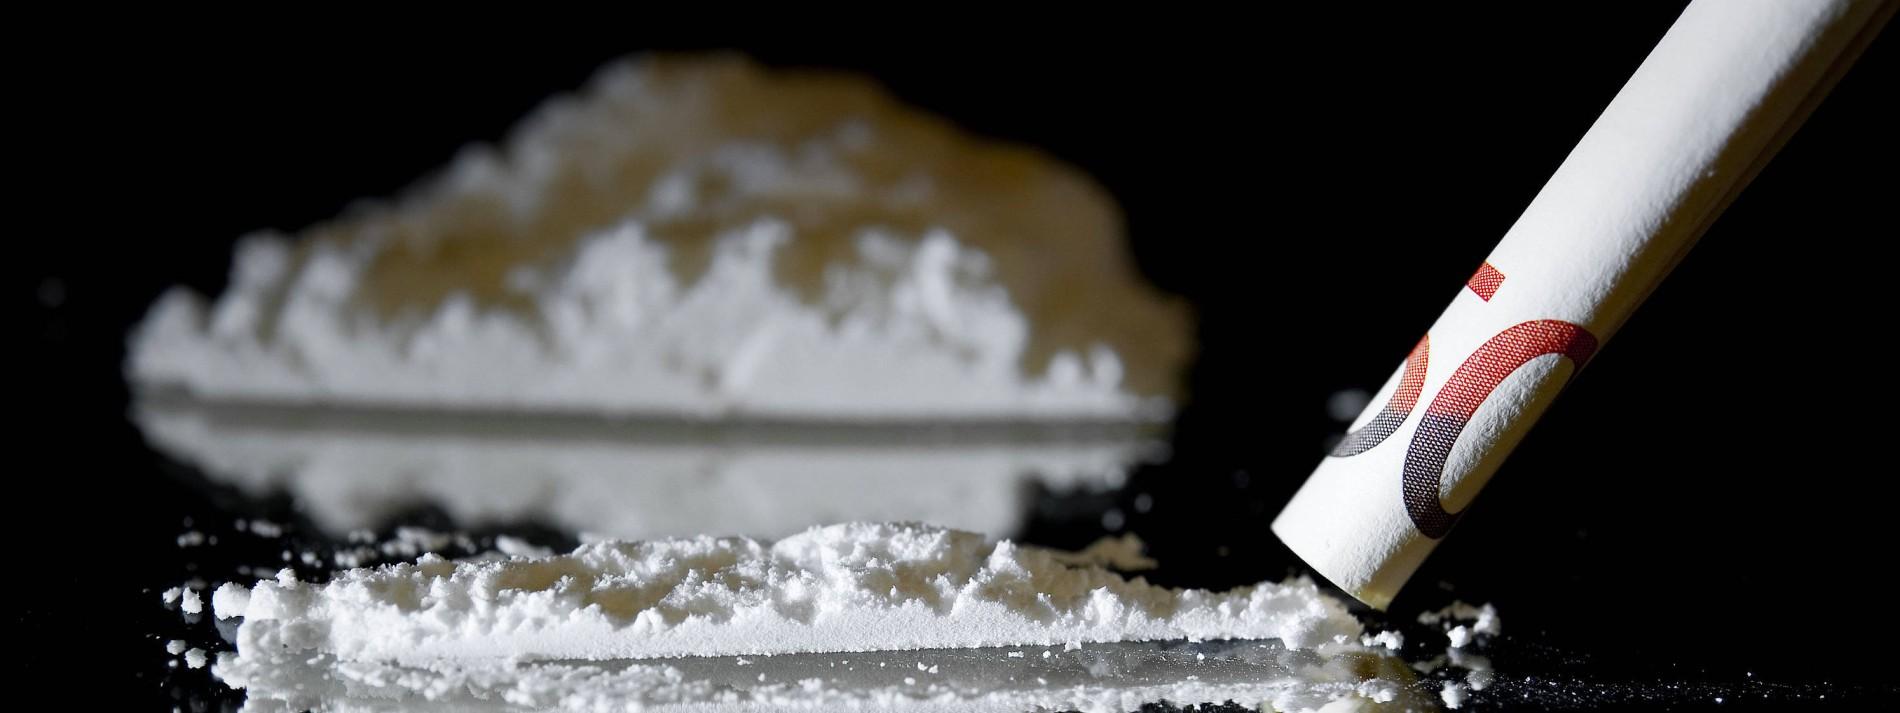 Kokaintests auf dem Weg ins Büro?